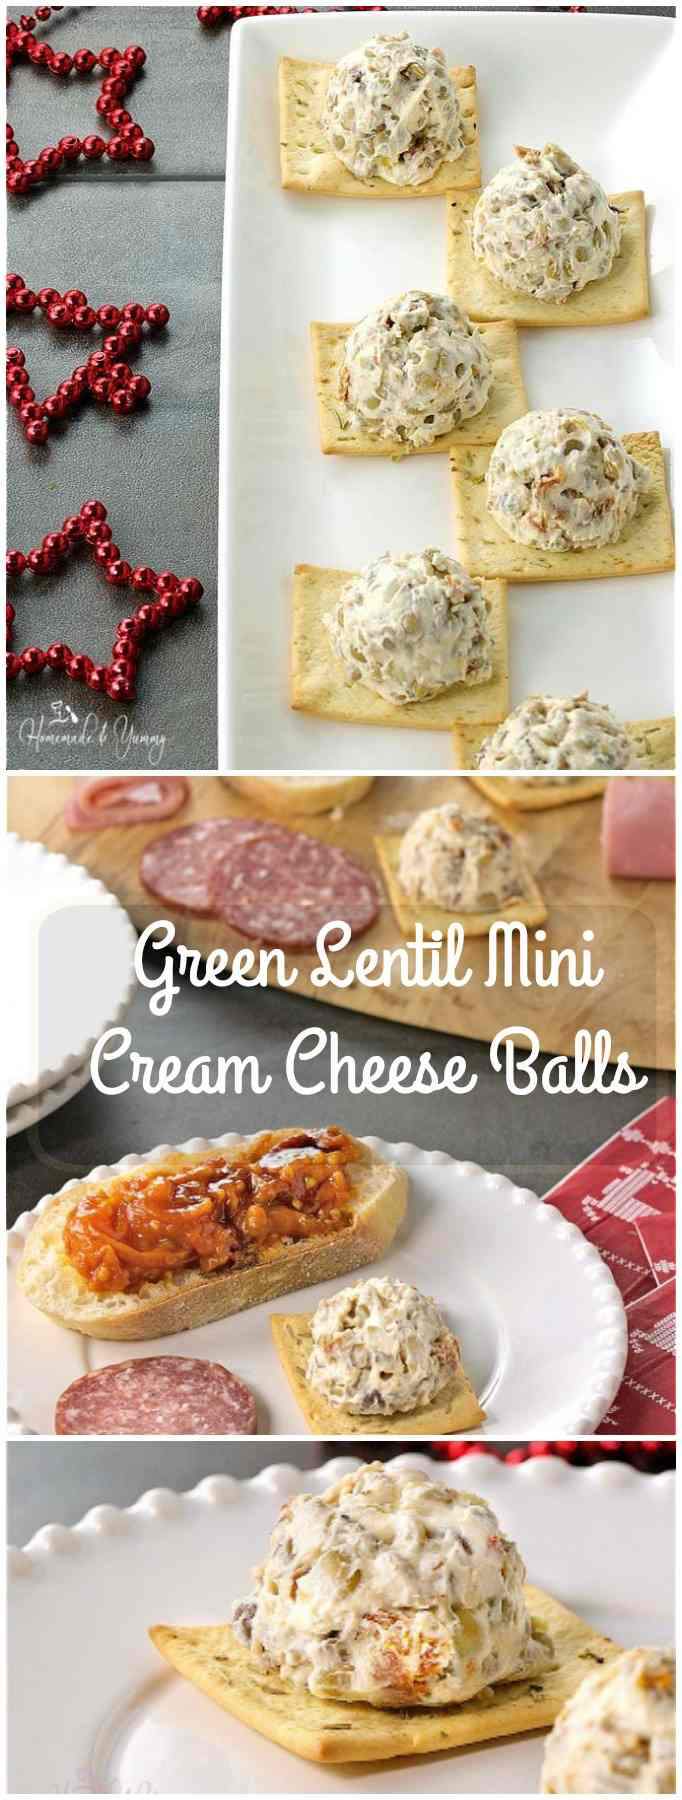 Green Lentil Mini Cream Cheese Balls long pin image.